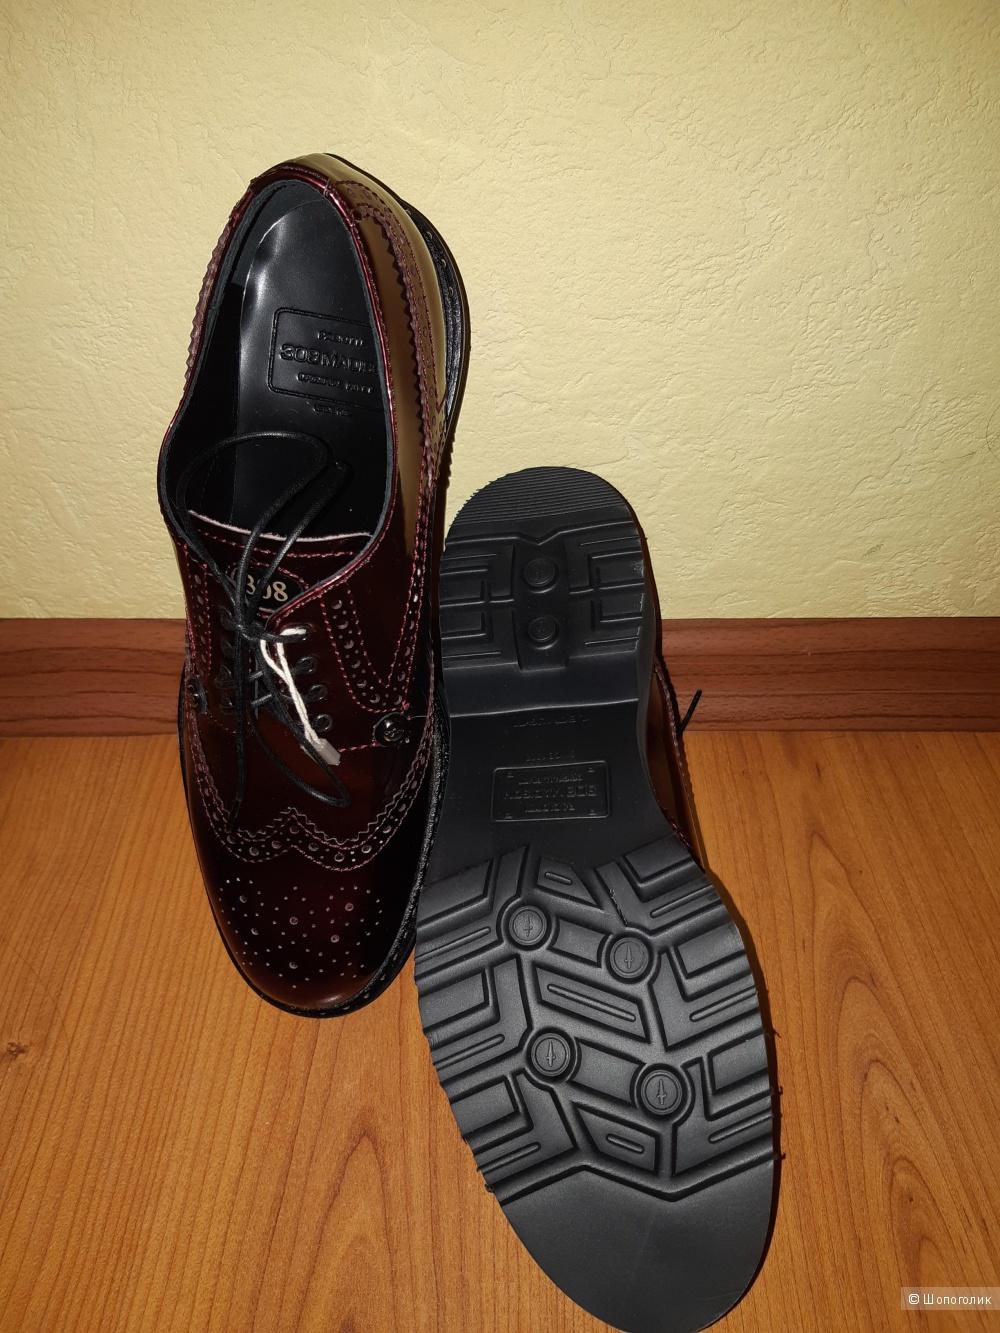 Ботинки Paciotti 308 Madison, 39(26.5 по стельке)